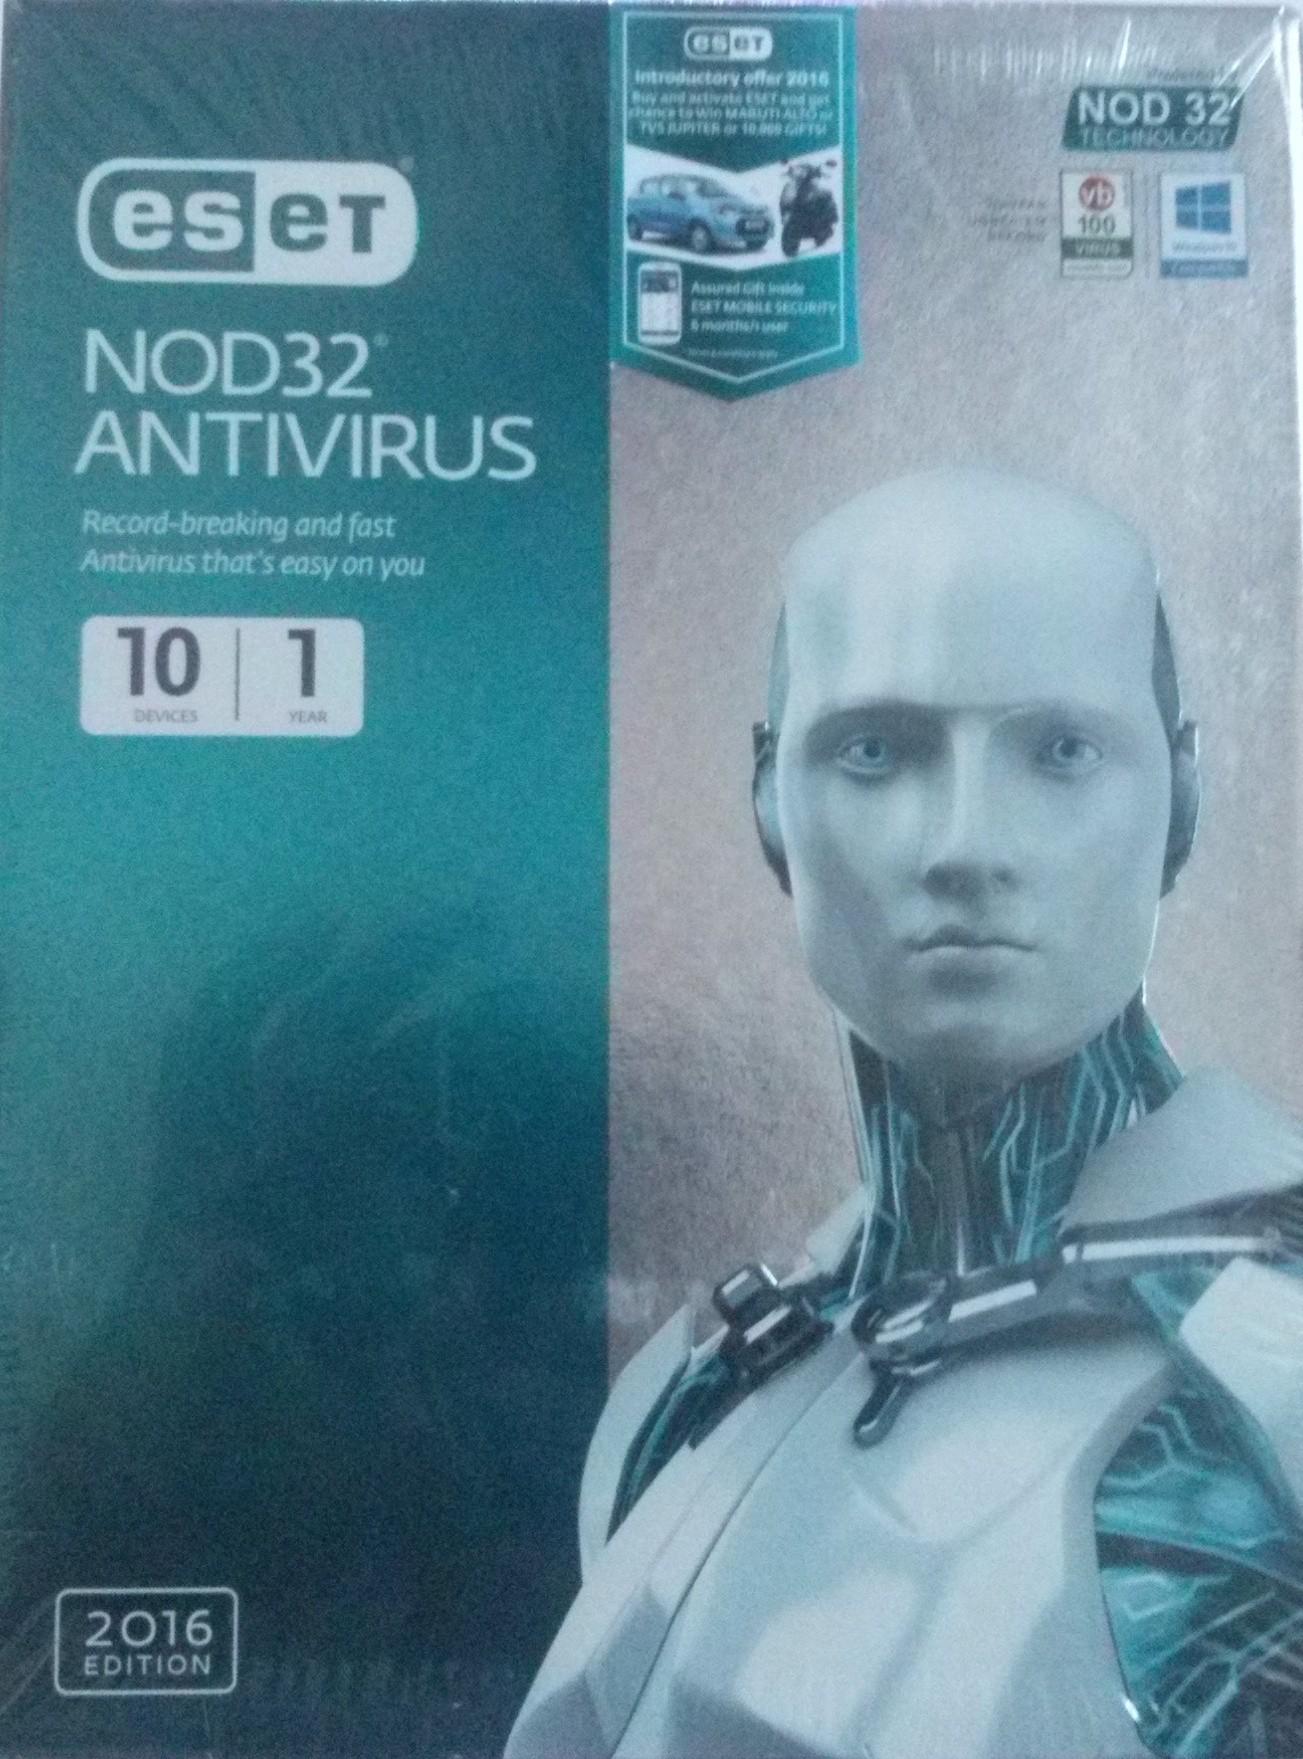 Eset Nod32 Antivirus 2016 Edition 10 PC 1 Year